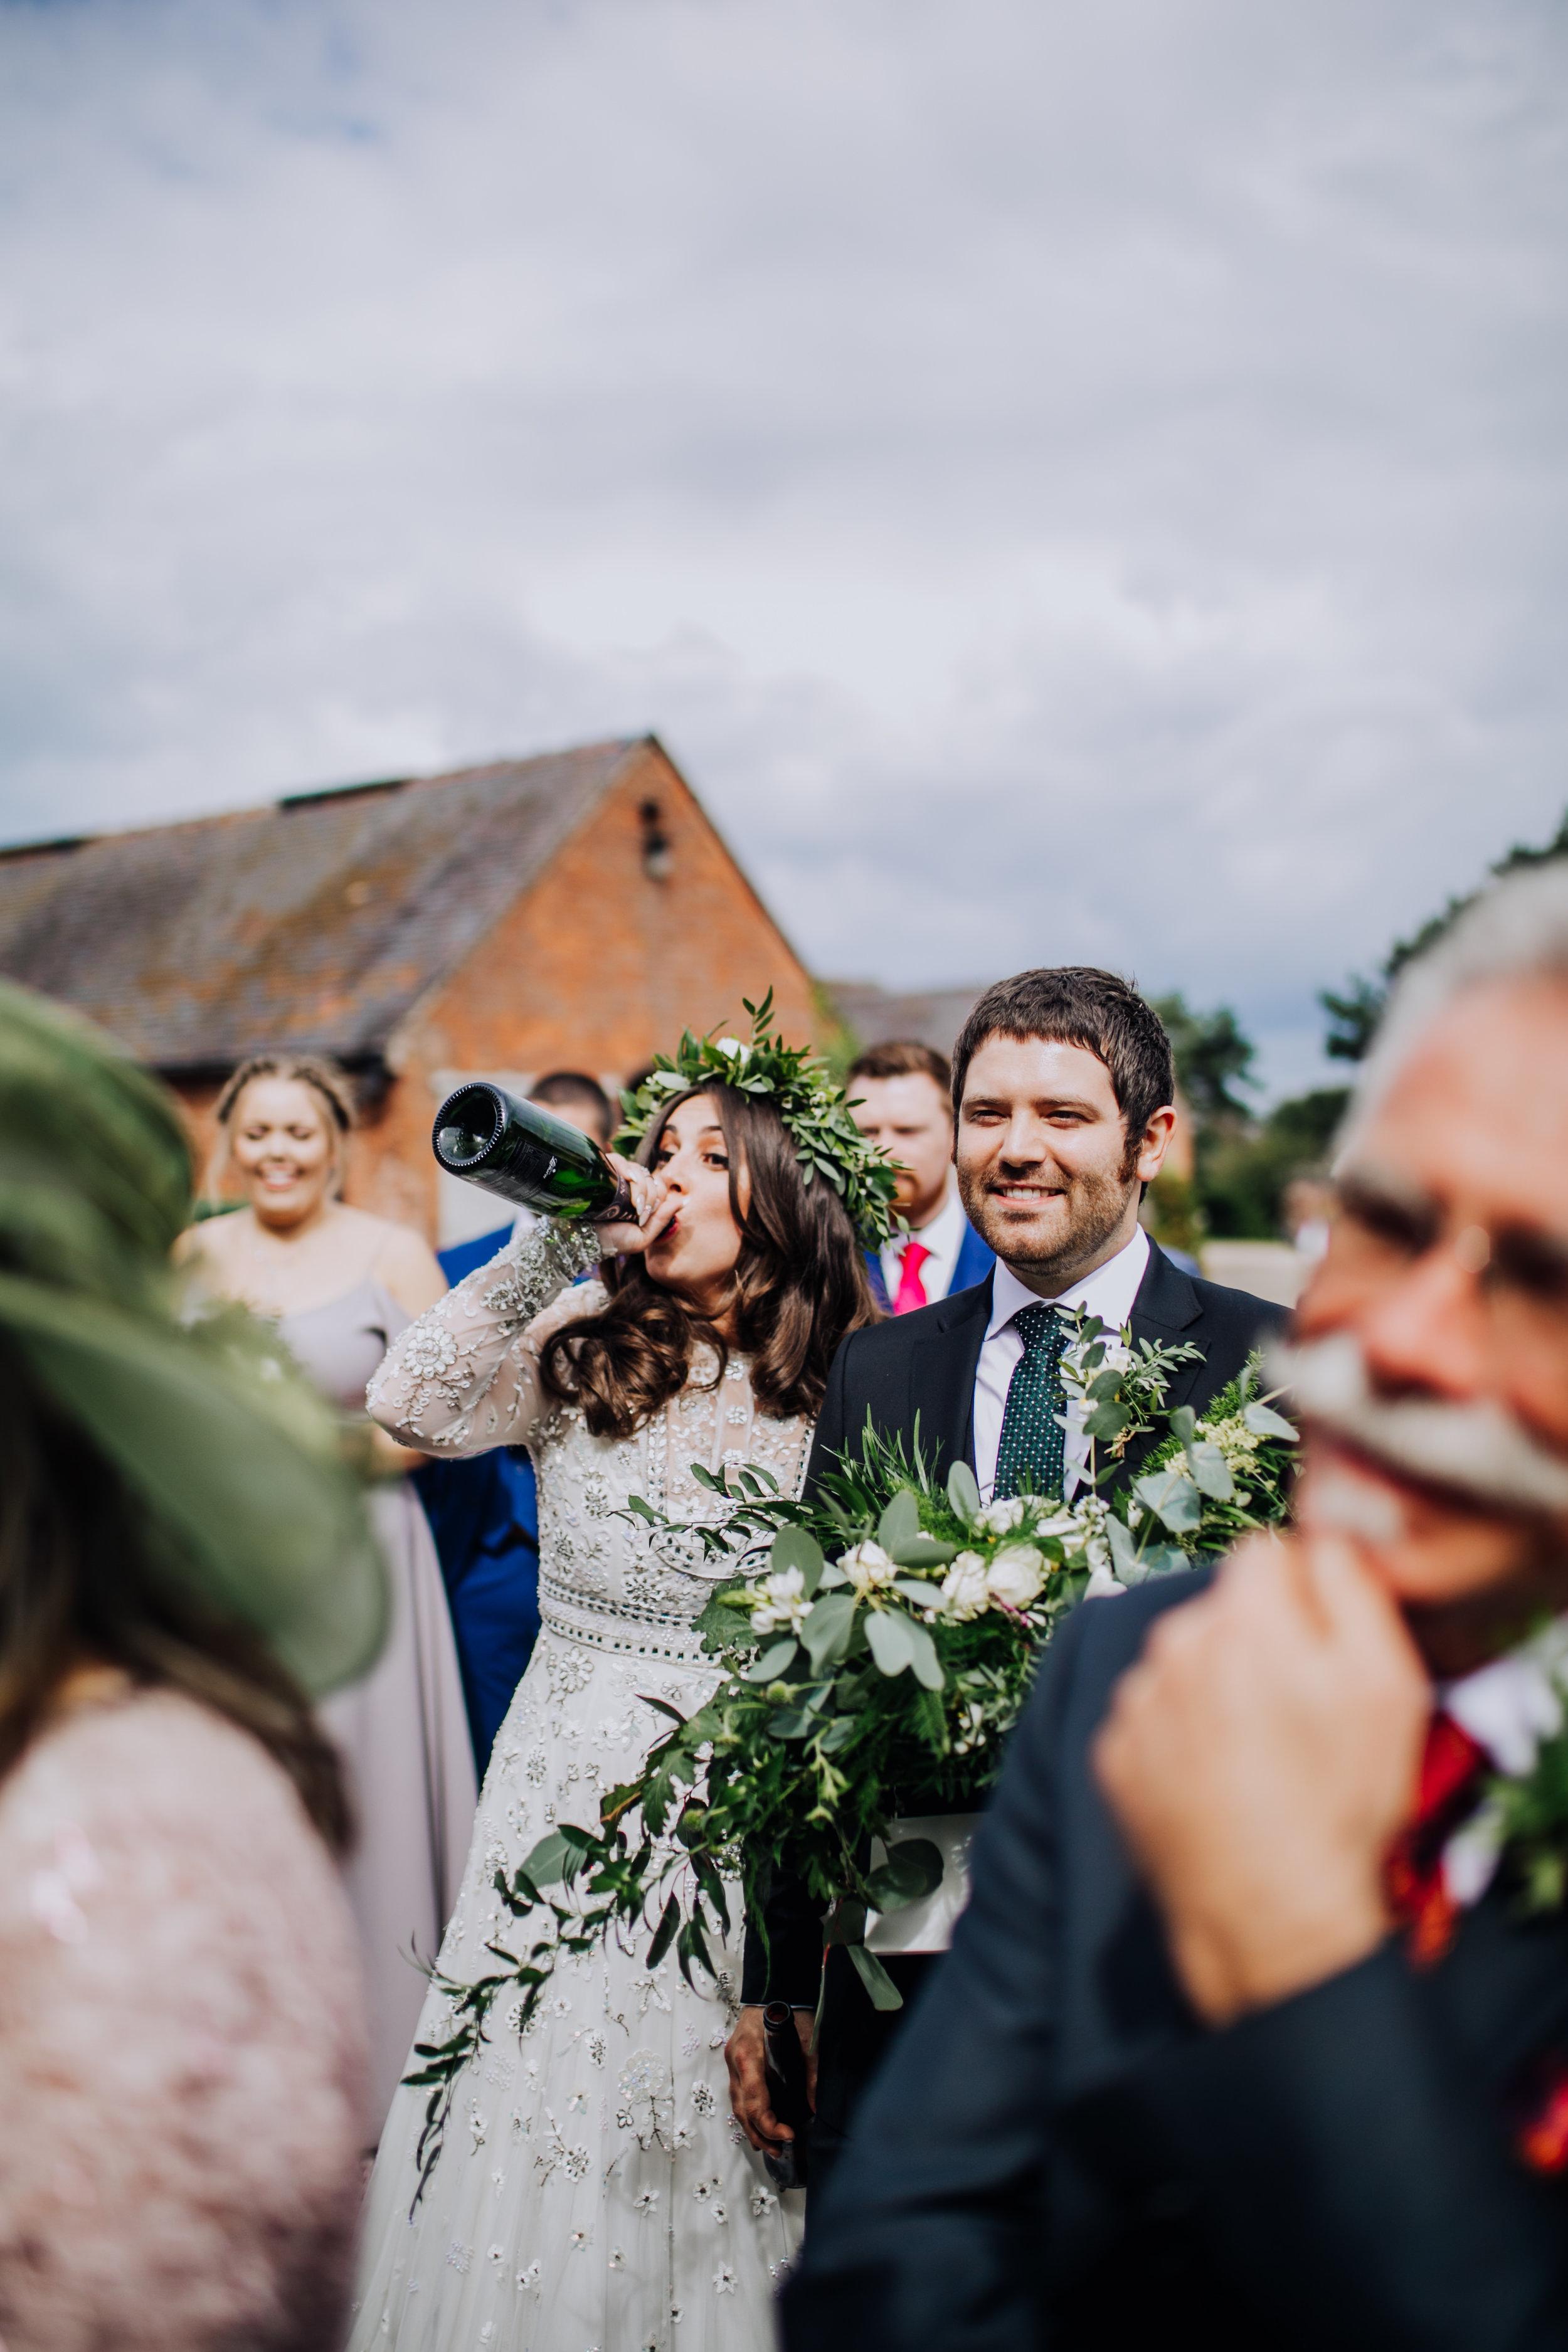 A festival barn wedding at Pimhill barns - Shropshire